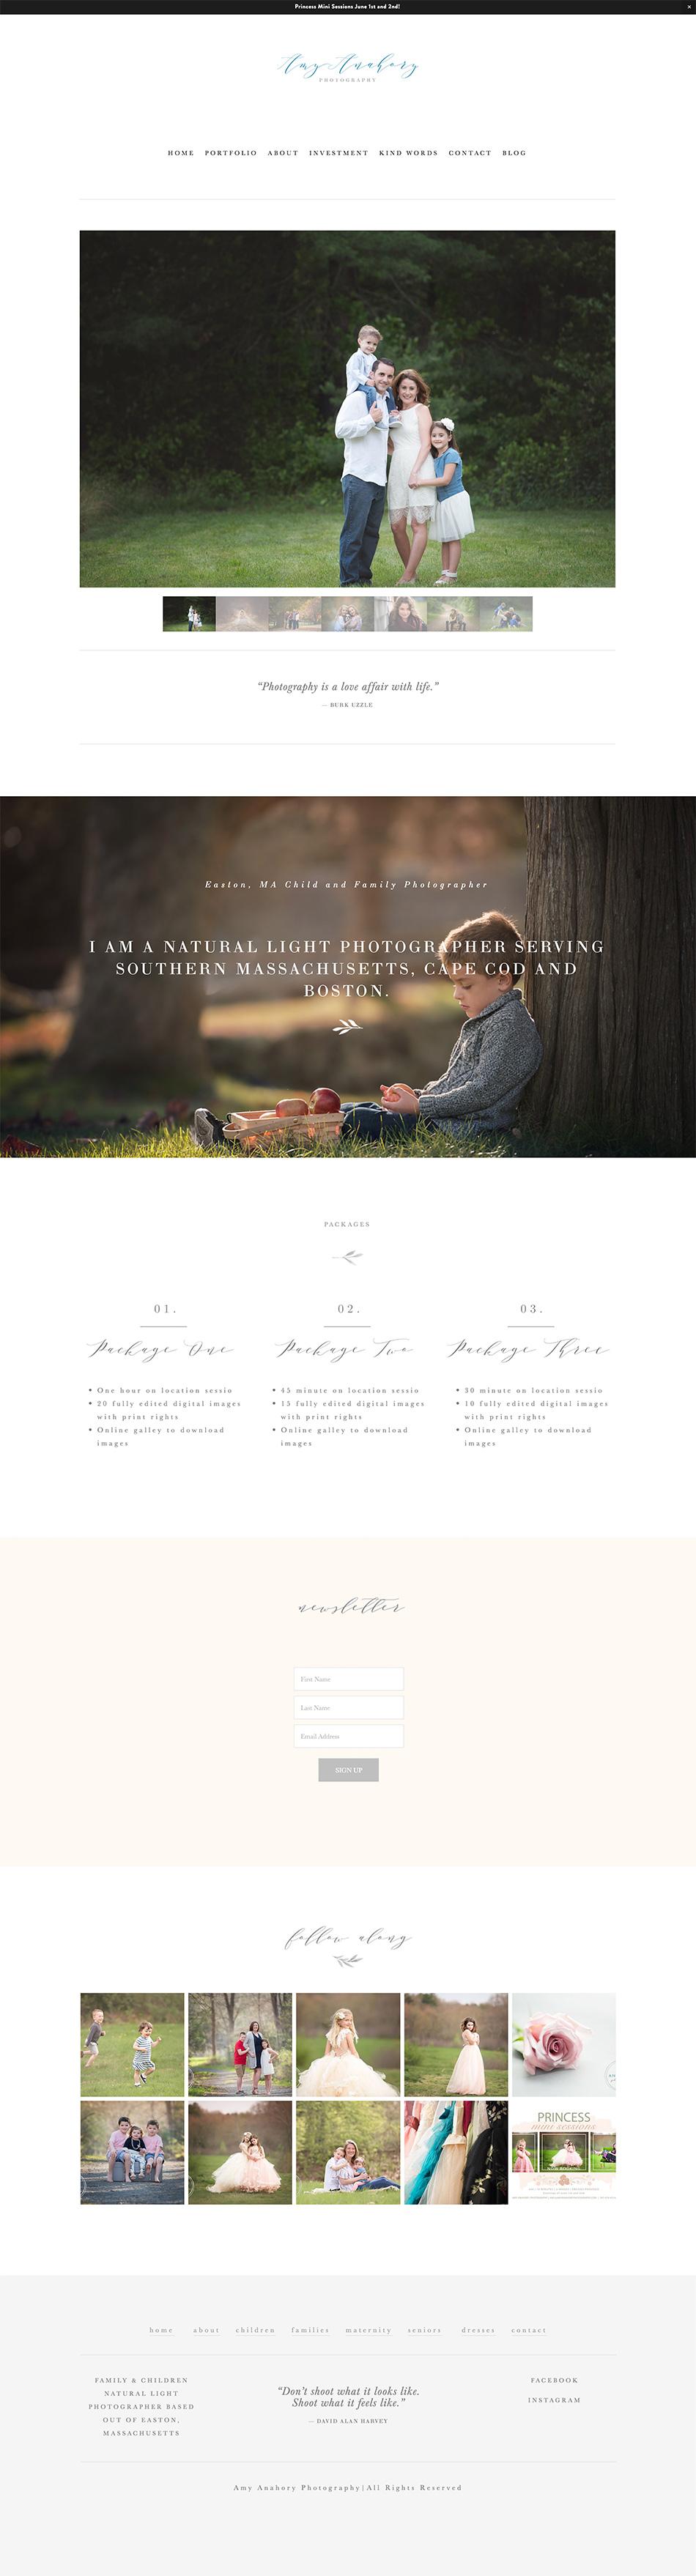 squarespace-website-design-1.jpg